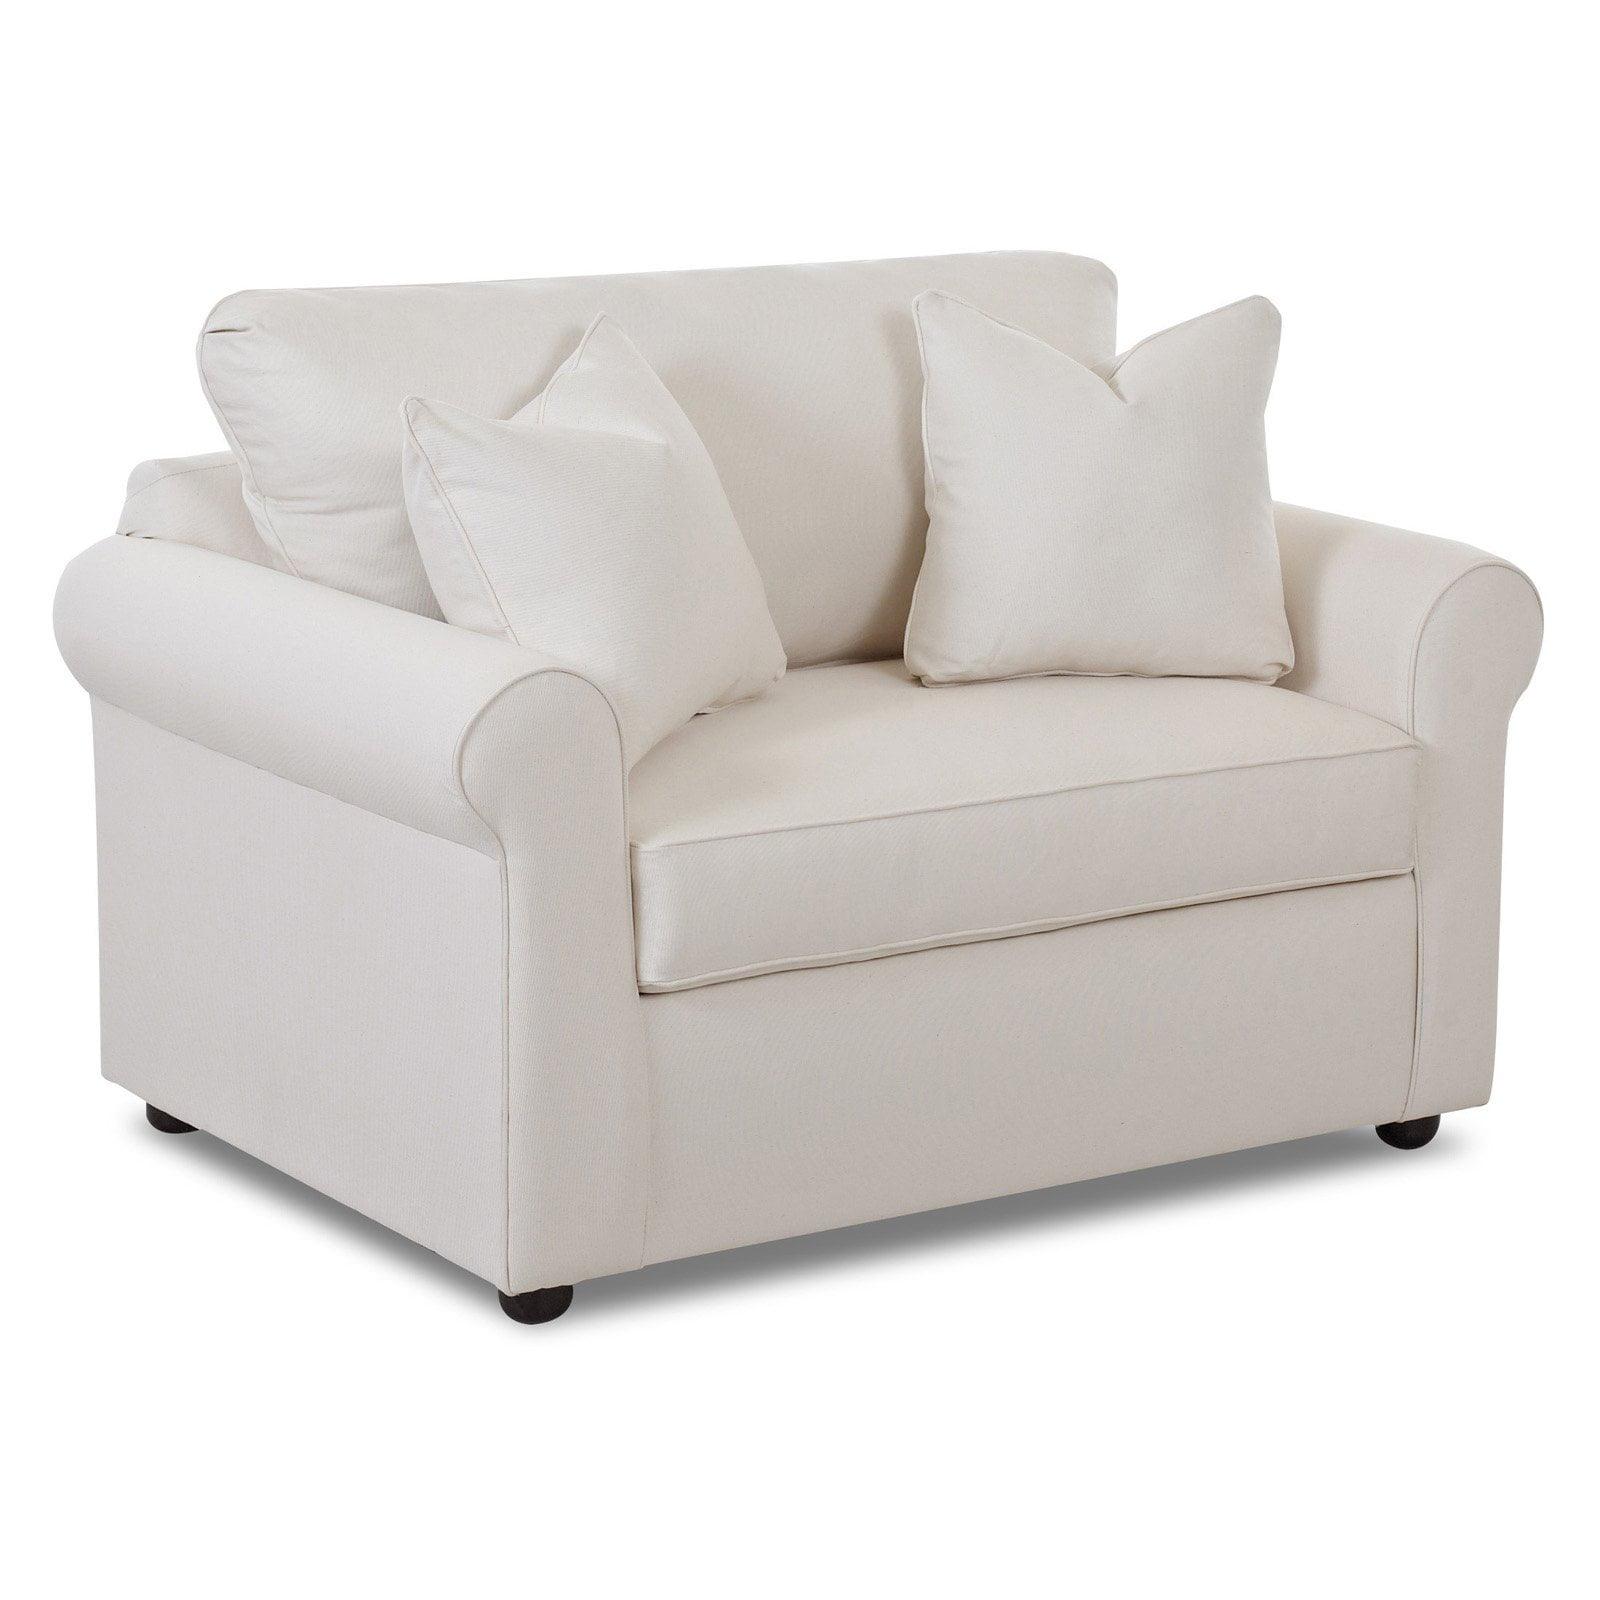 Klaussner Brighton Dreamquest Club Chair by Klaussner Furniture Industries